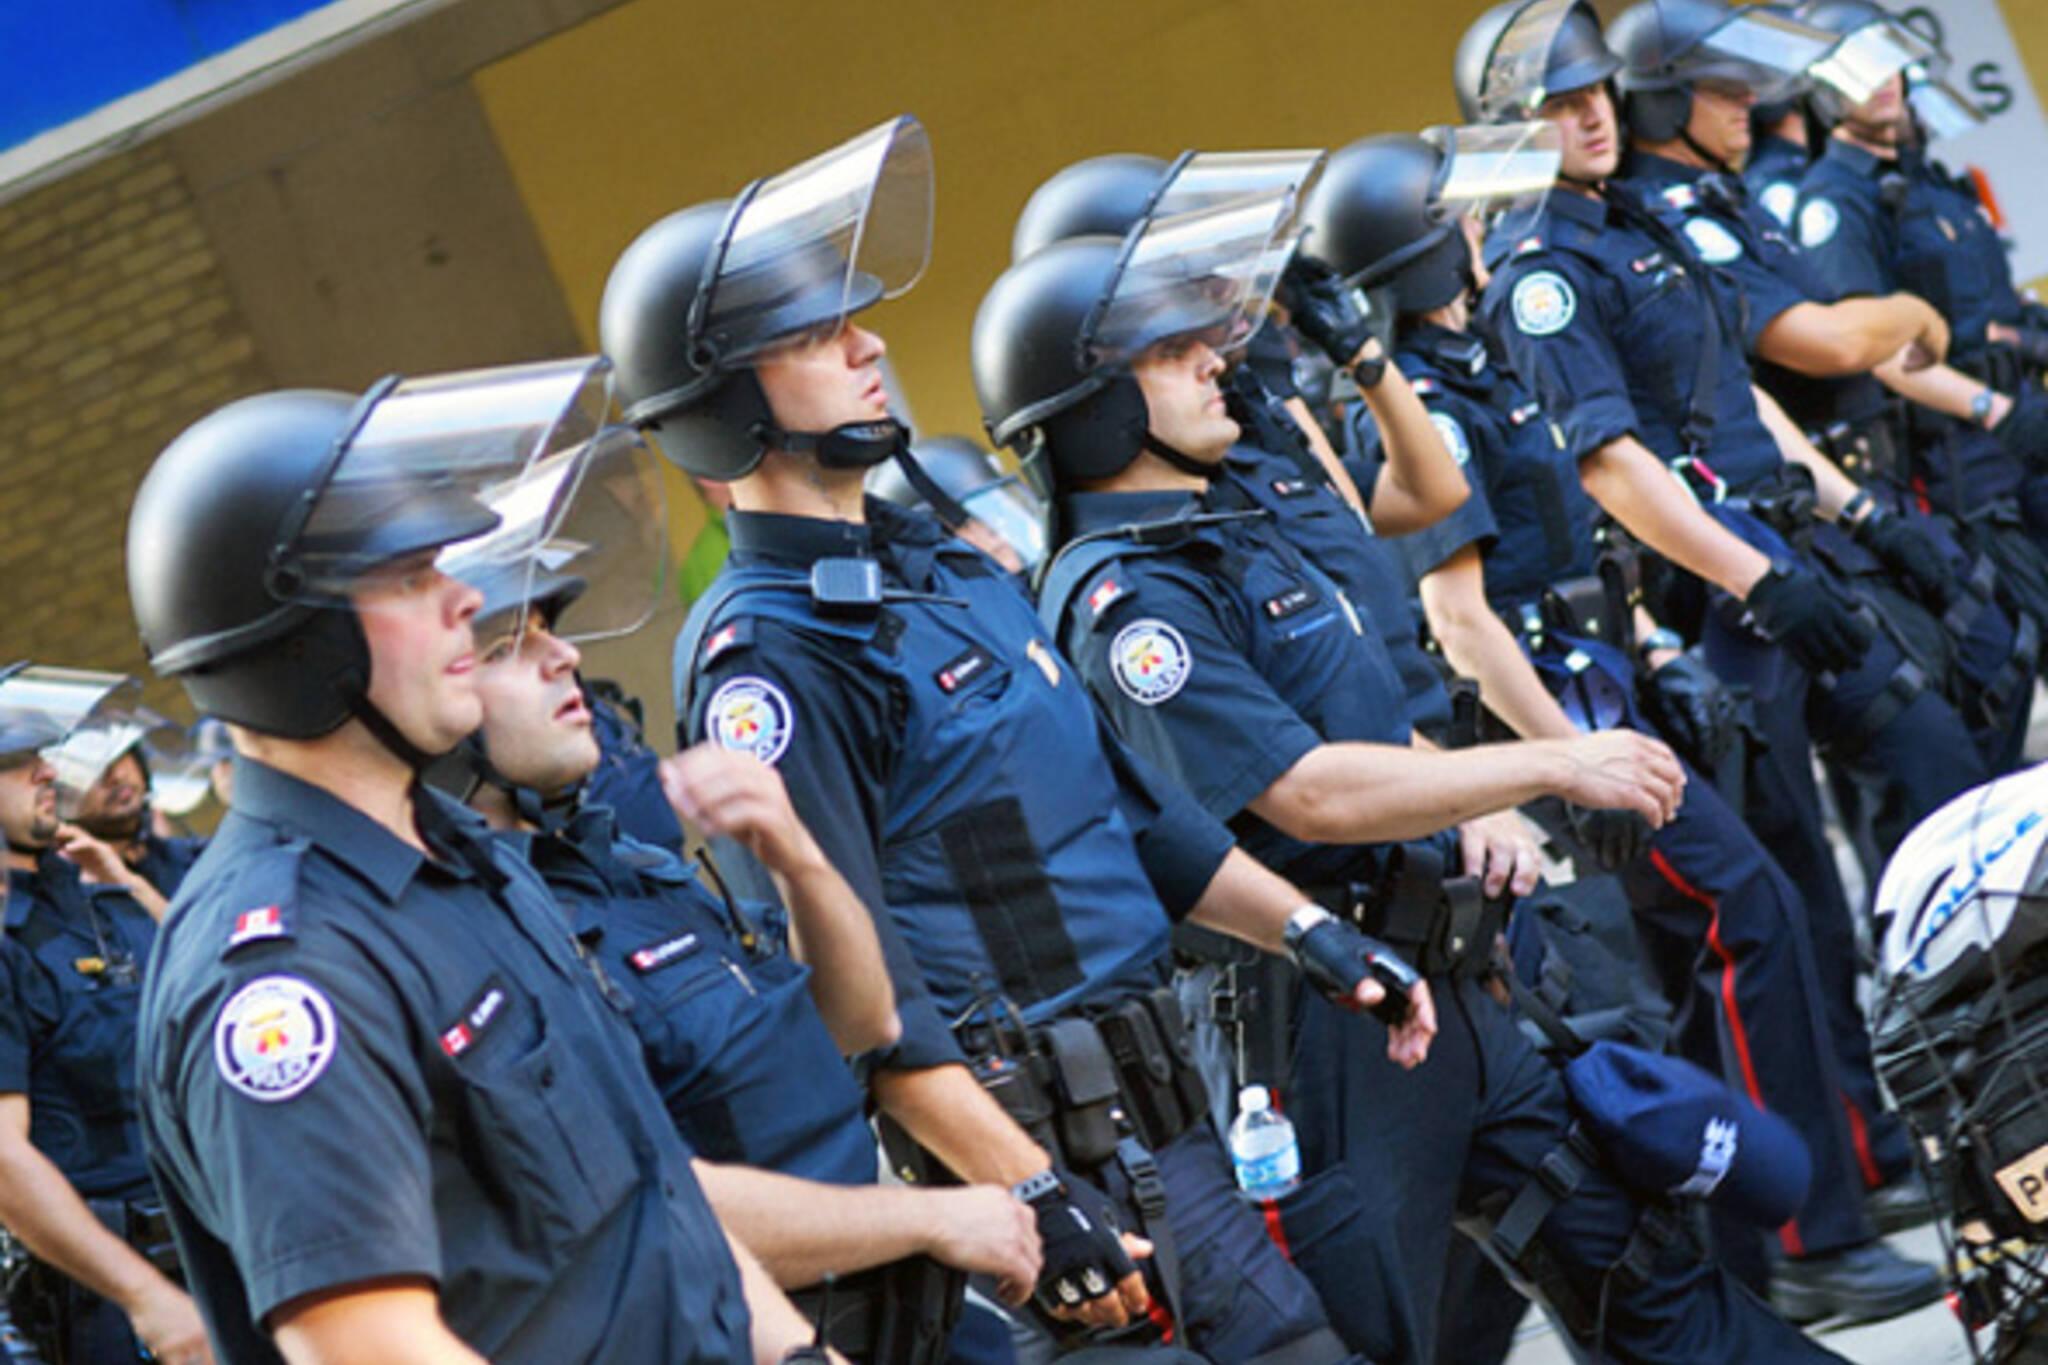 G20 Riot Police